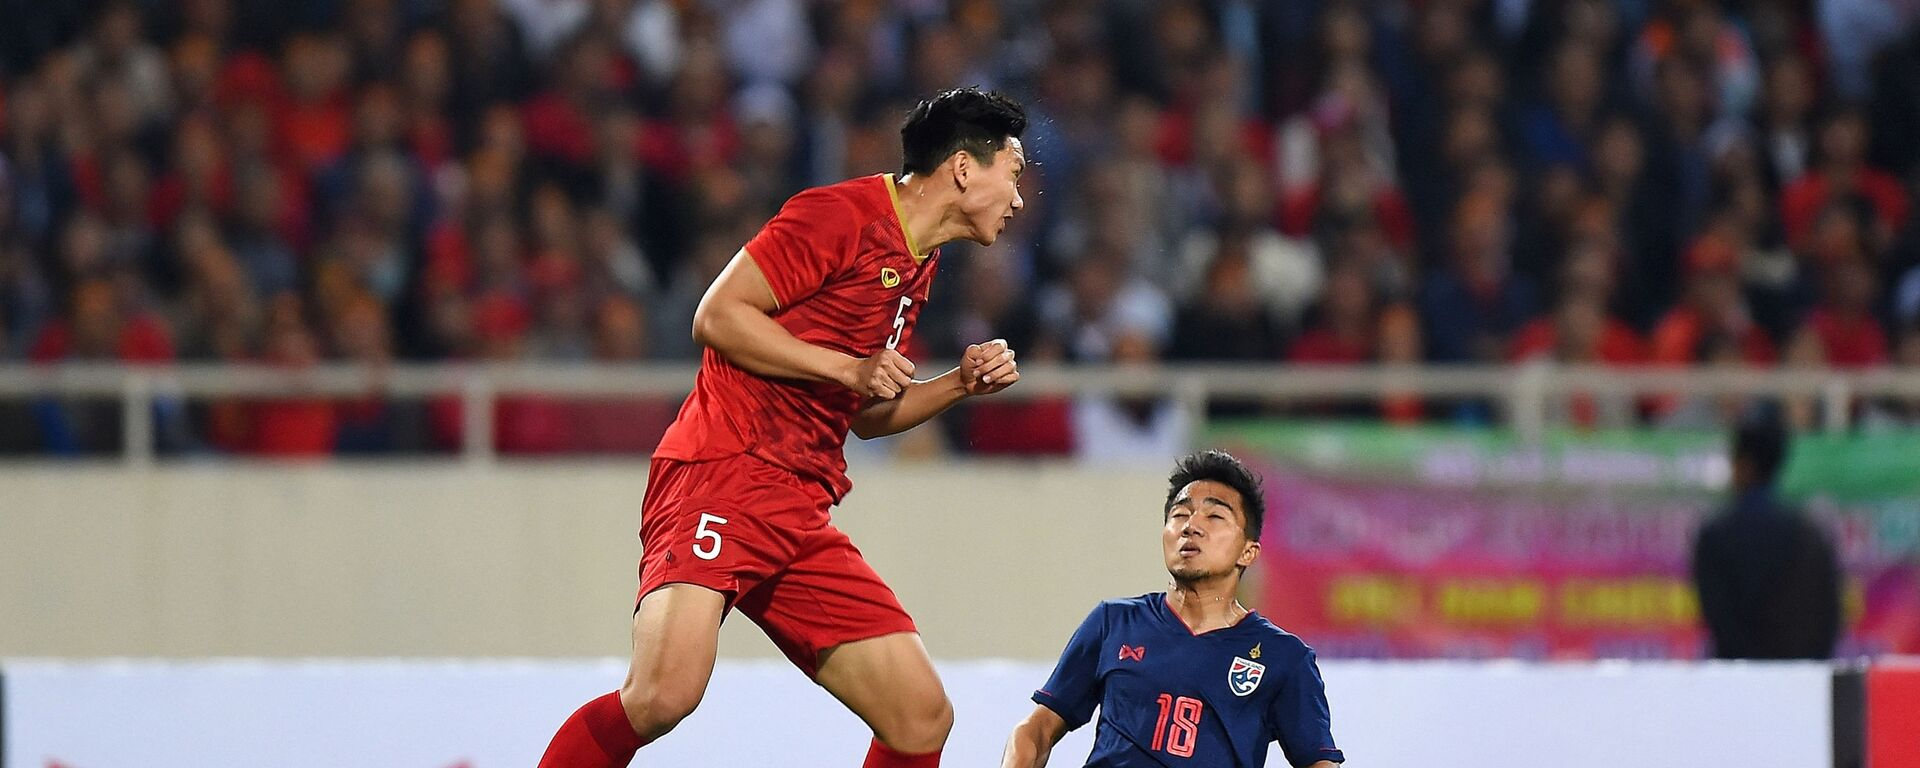 Vòng loại World Cup 2022. - Sputnik Việt Nam, 1920, 13.05.2021